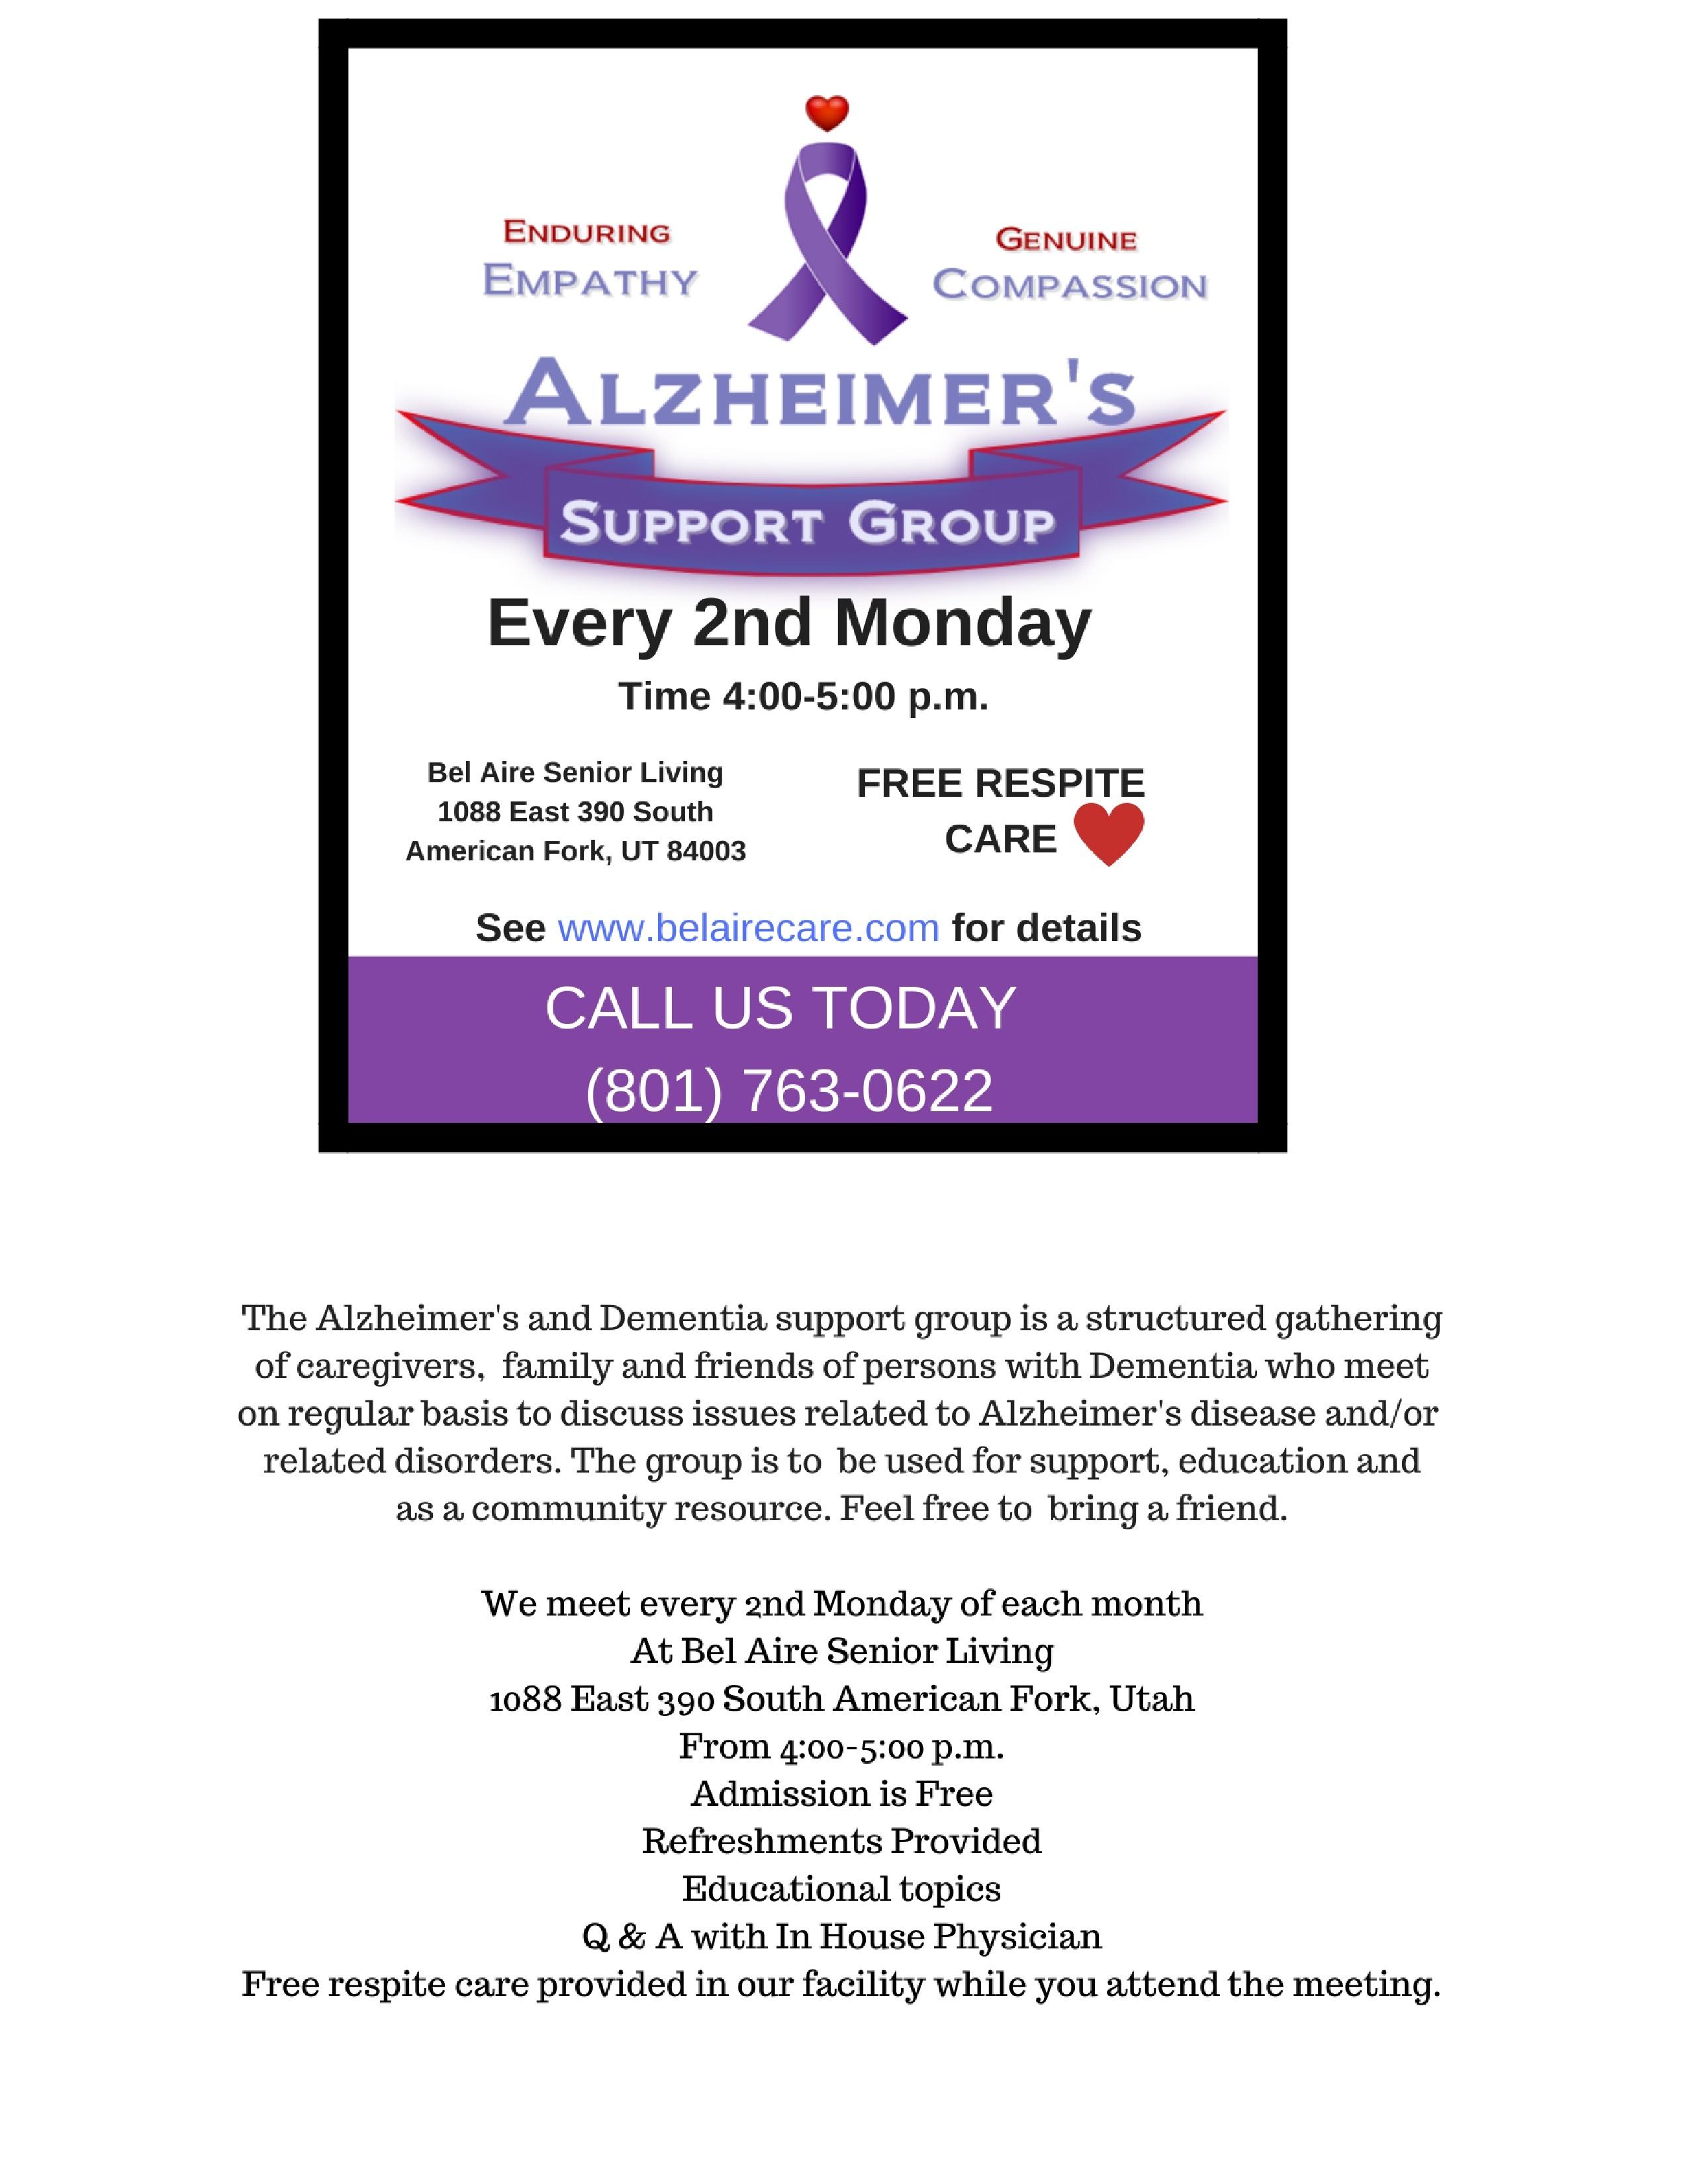 Alzheimer's Meeting on Monday